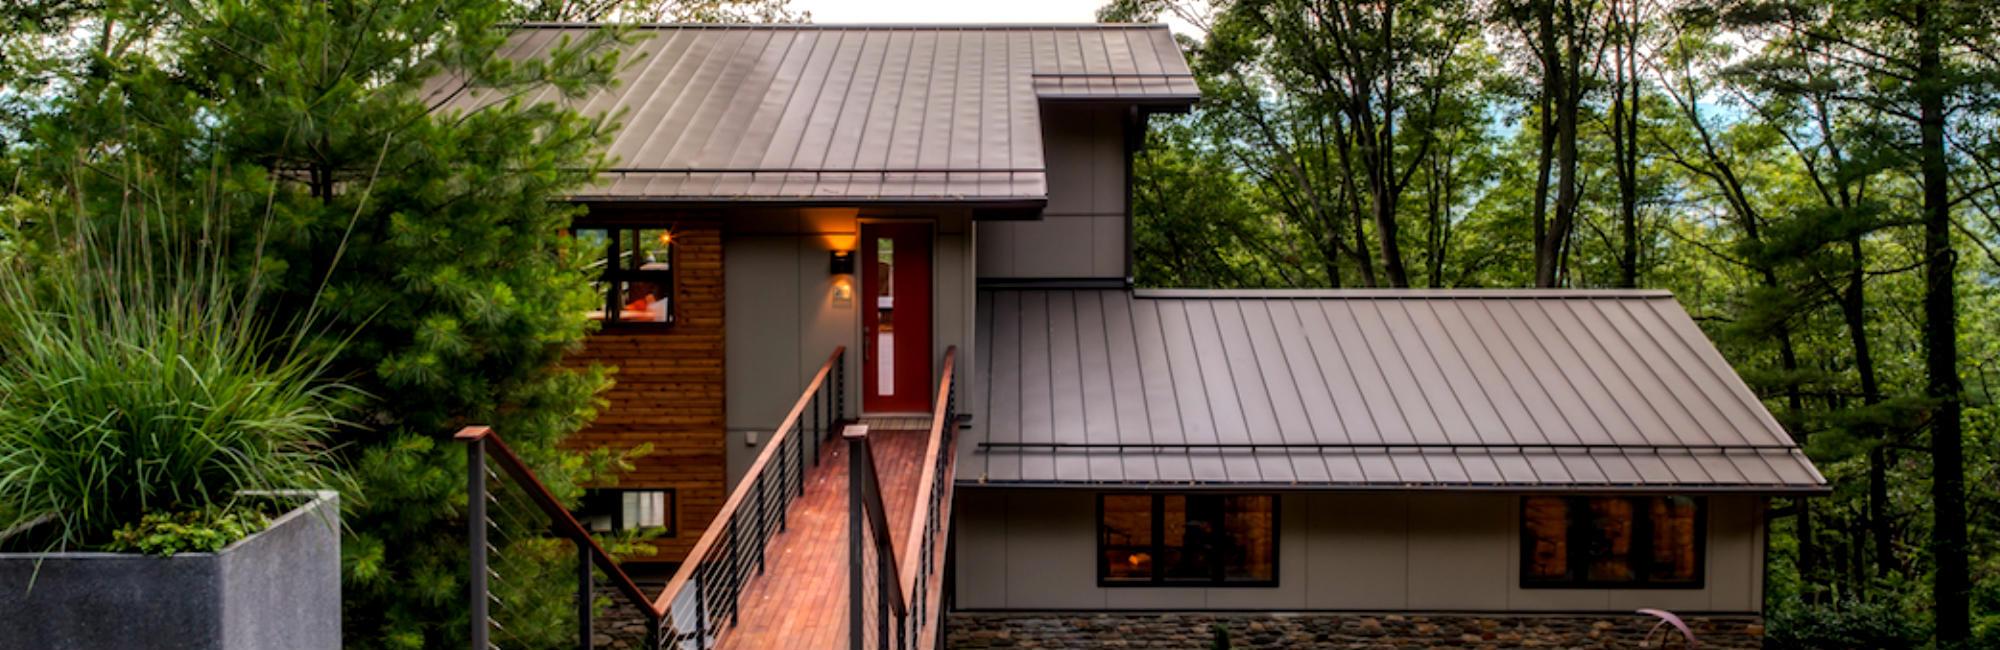 Asheville Home Building